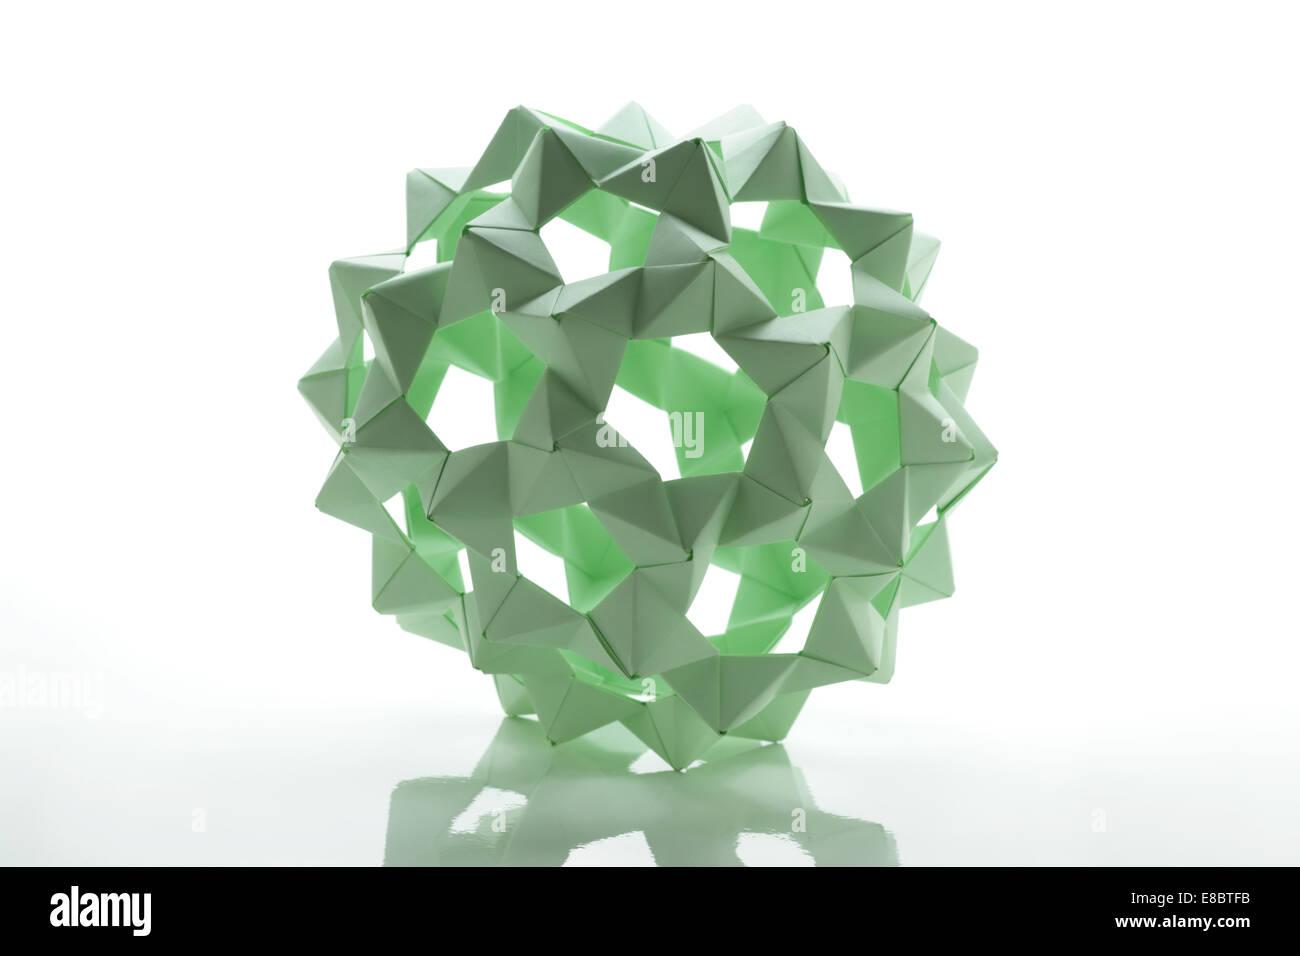 Modular origami polyhedron - Stock Image